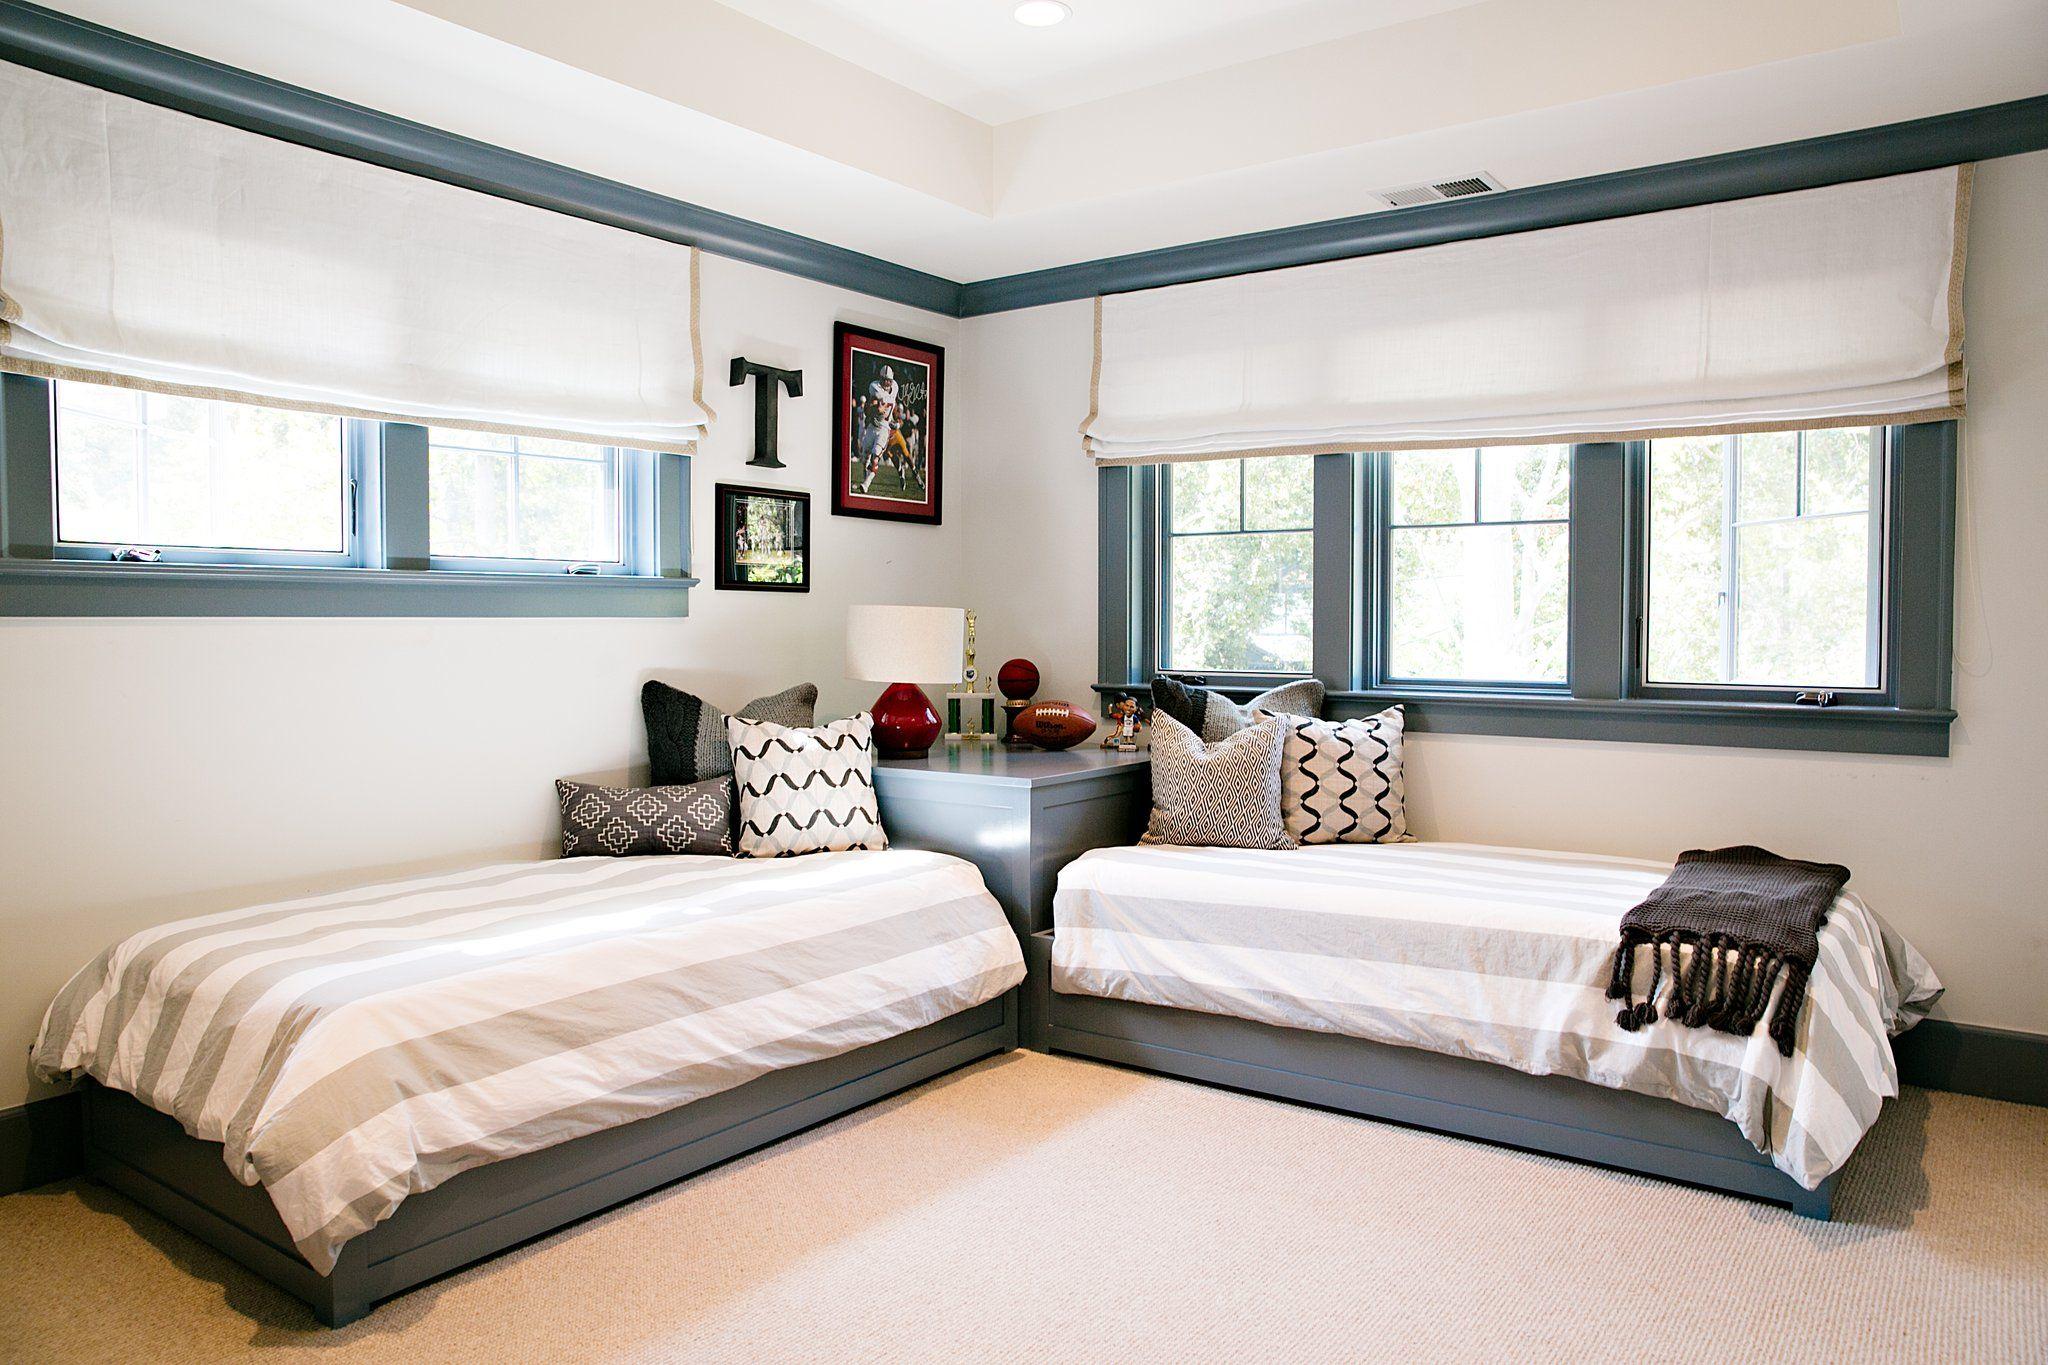 11 Pro Secrets To Designing A Beautiful Shared Kidsu0027 Room